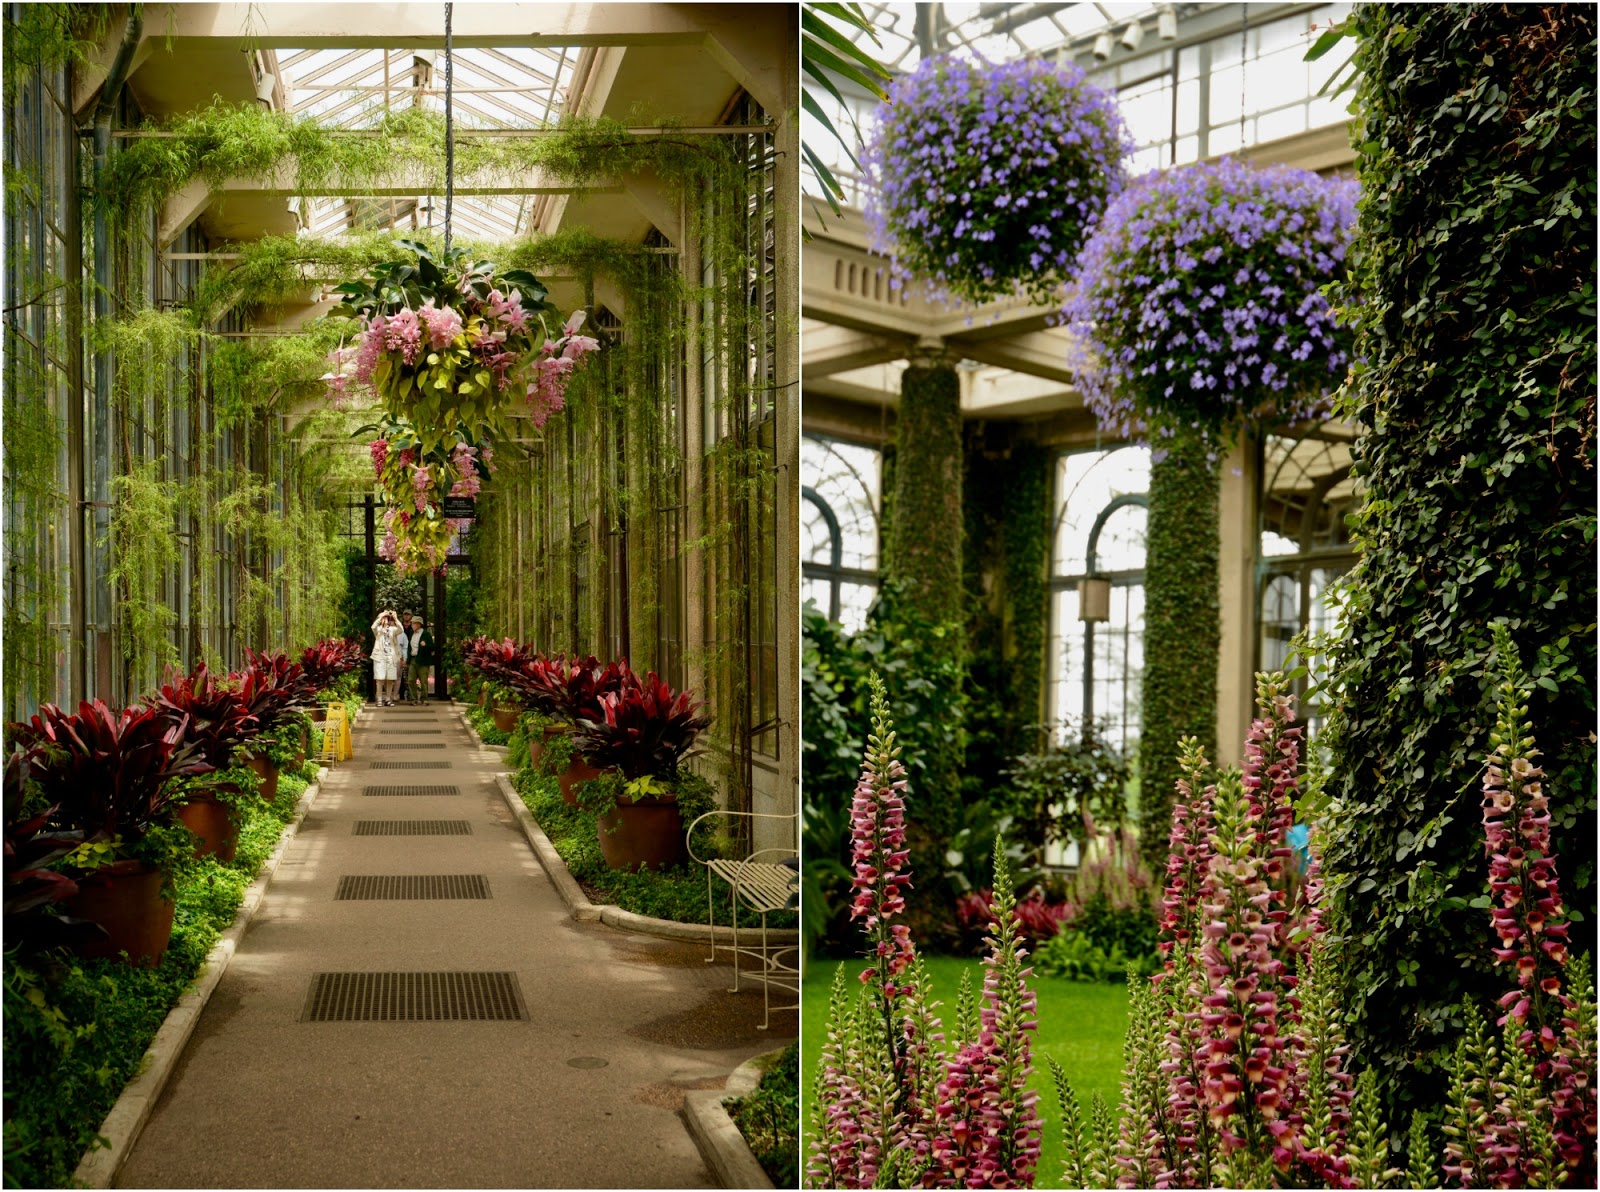 Random-osity: Longwood Gardens